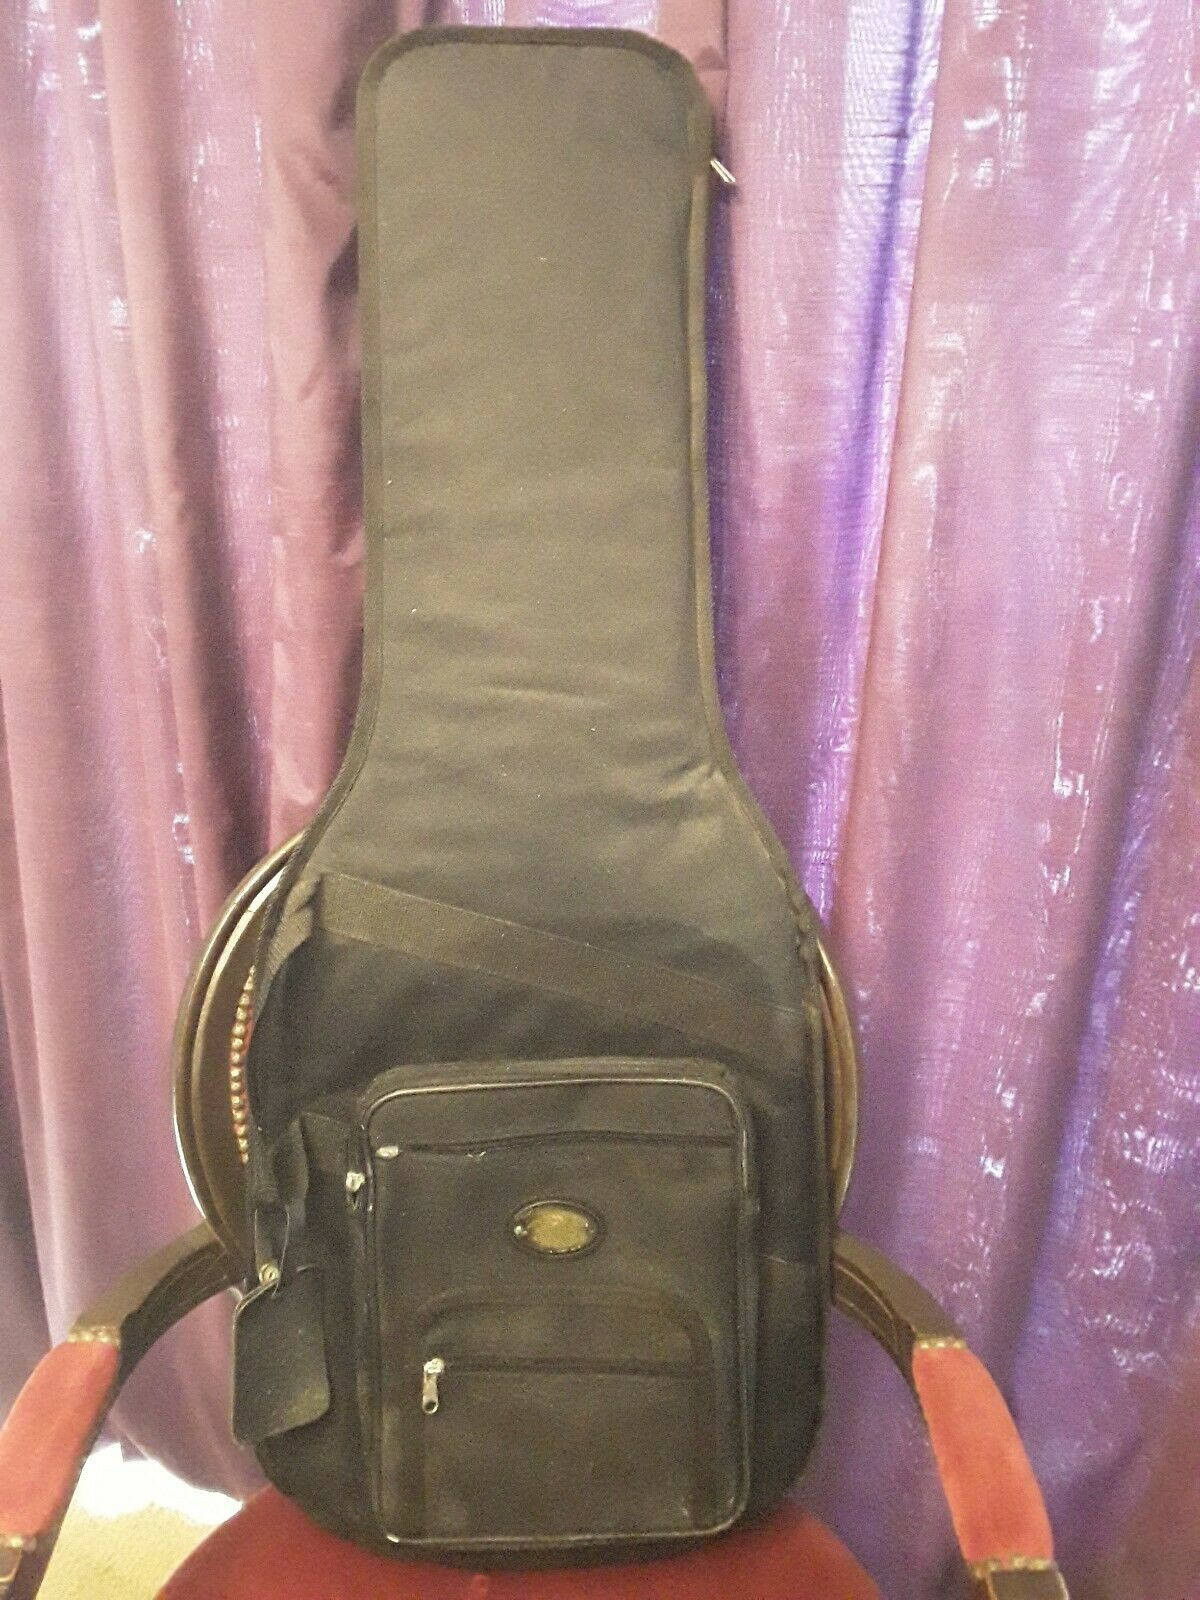 Fender Squire Stratocaster Guitarra Eléctrica De Mano Izquierda-Cuerpo Negro, Pau Pau Pau Ferro.. 716f13